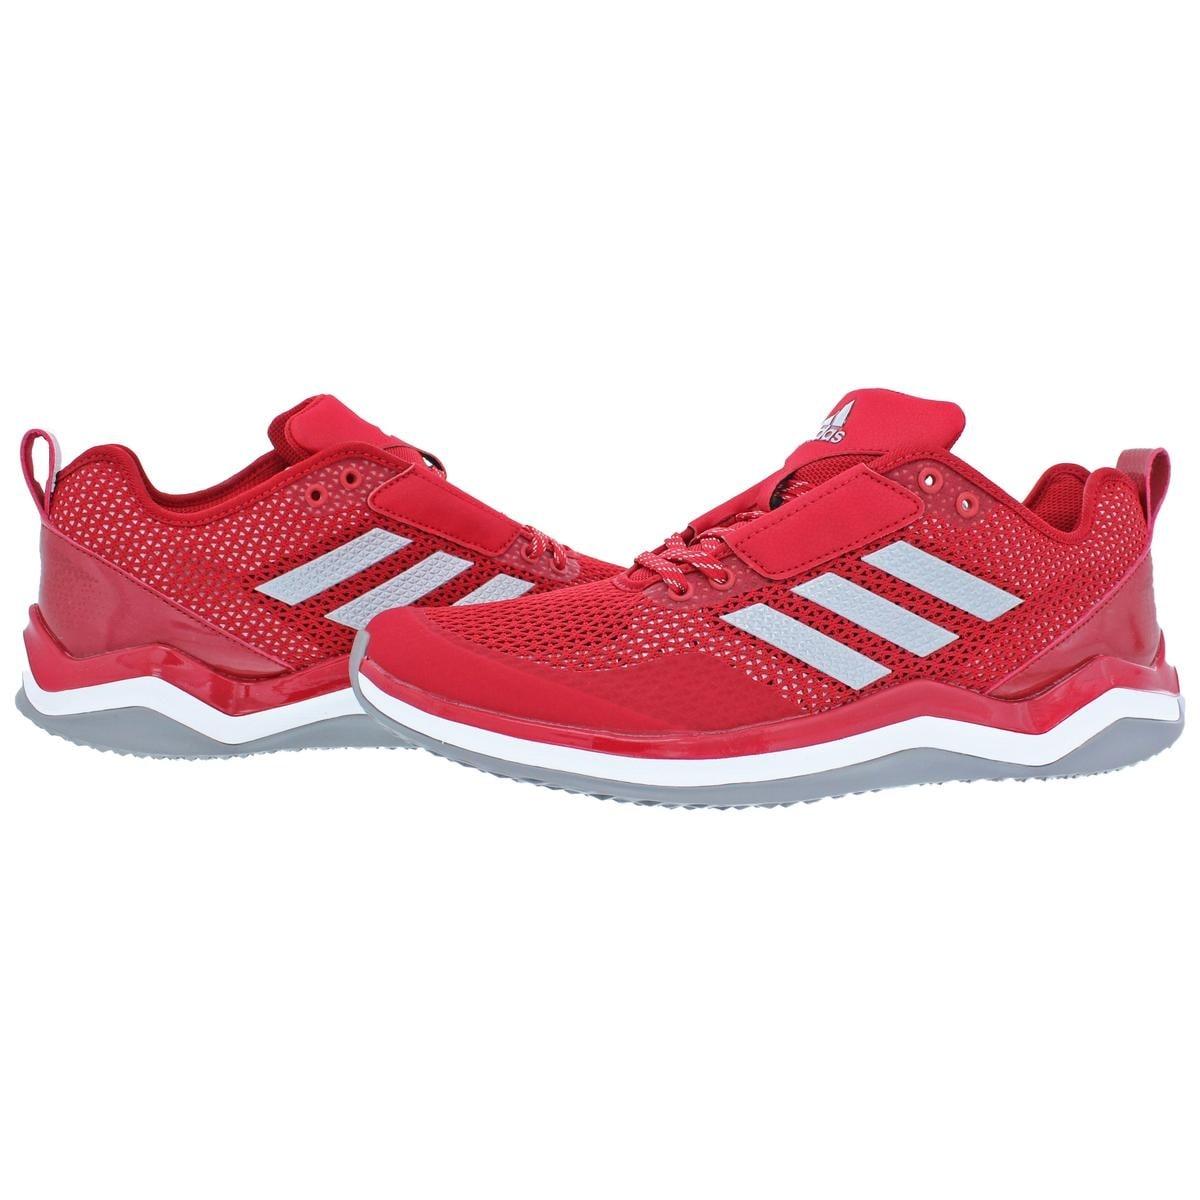 Shop Adidas Mens Speed Trainer 3.0 Baseball Shoes IRONSKIN Turf ... aa8ae71327a